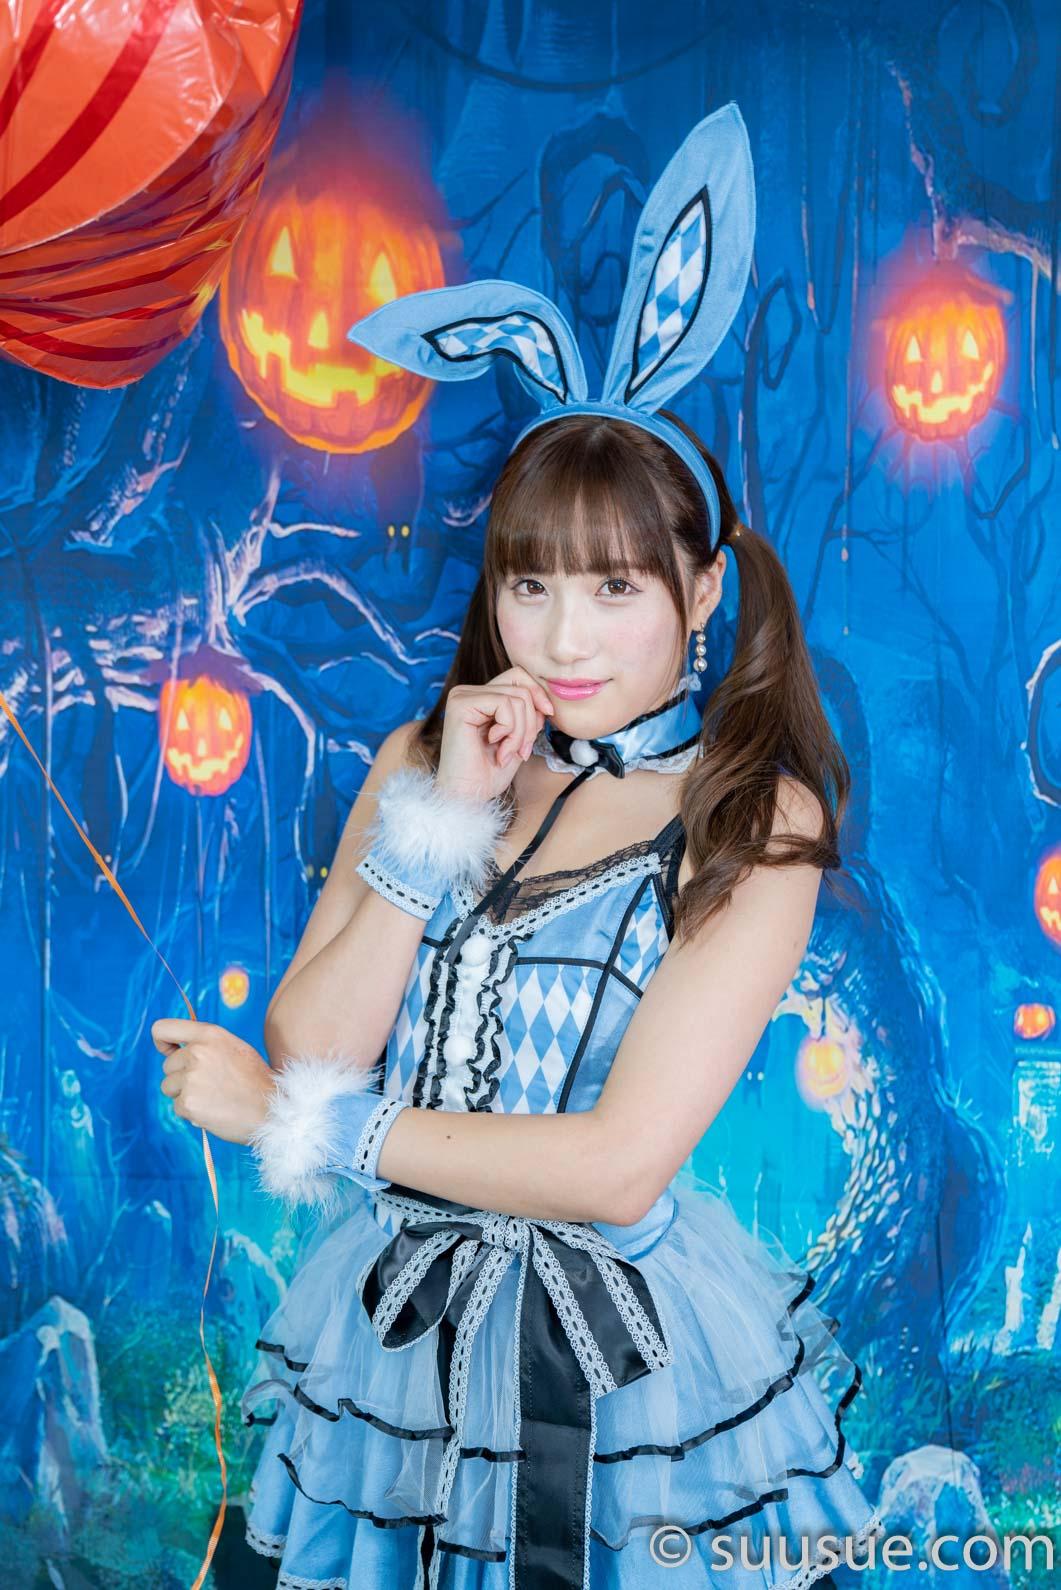 2018/10/28 NewType撮影会 空陸海ゆきな バニーガール